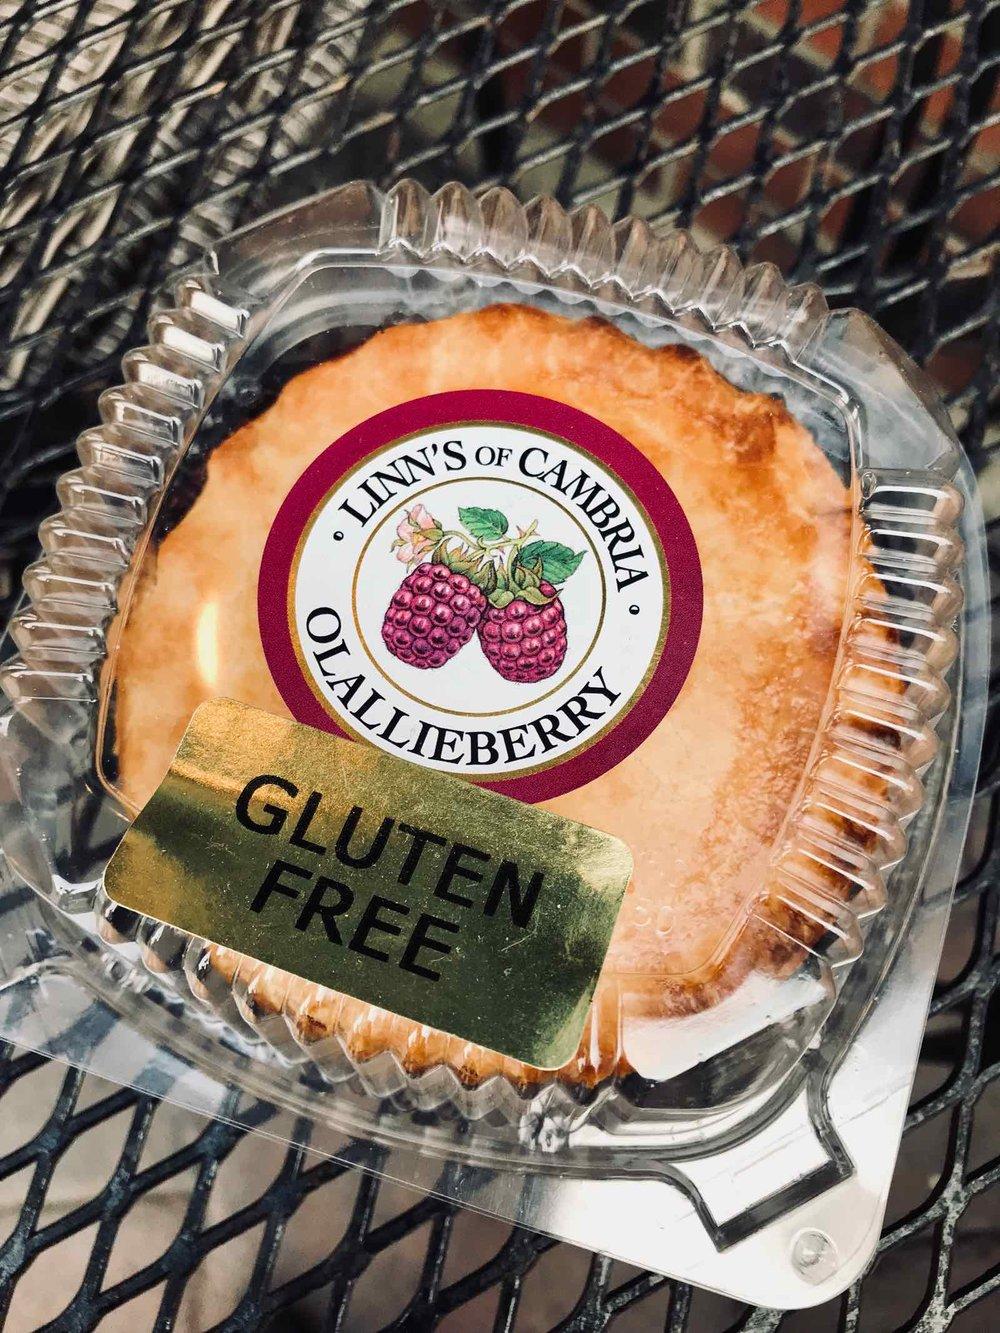 Gluten-Gree-Olallieberry-Pie-Linns-of-Cambria.jpg